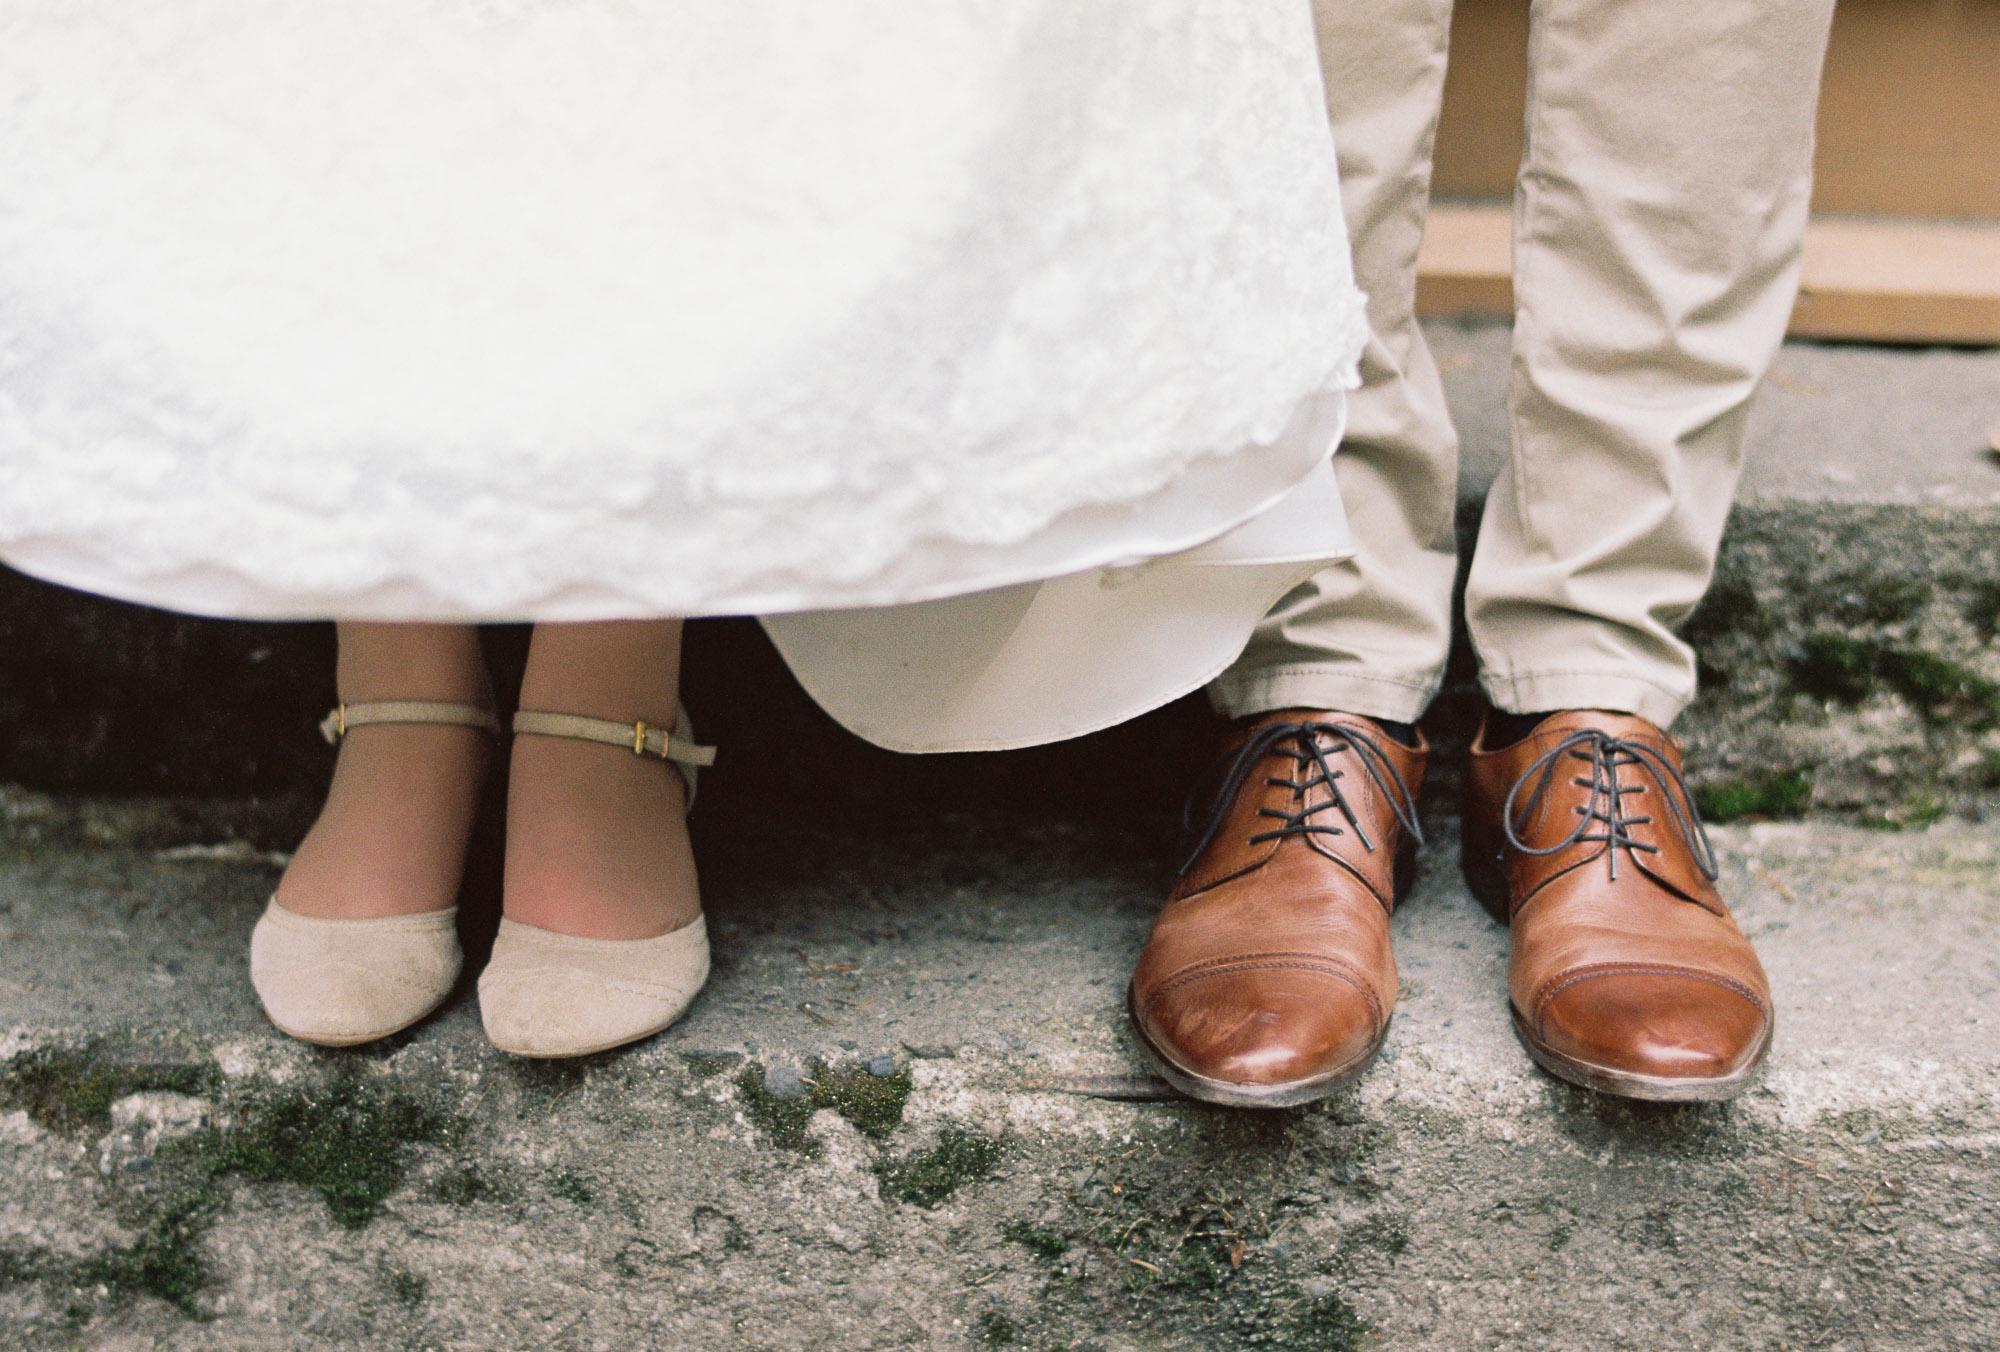 jere-satamo-analog-film-wedding-photographer-finland-120.jpg